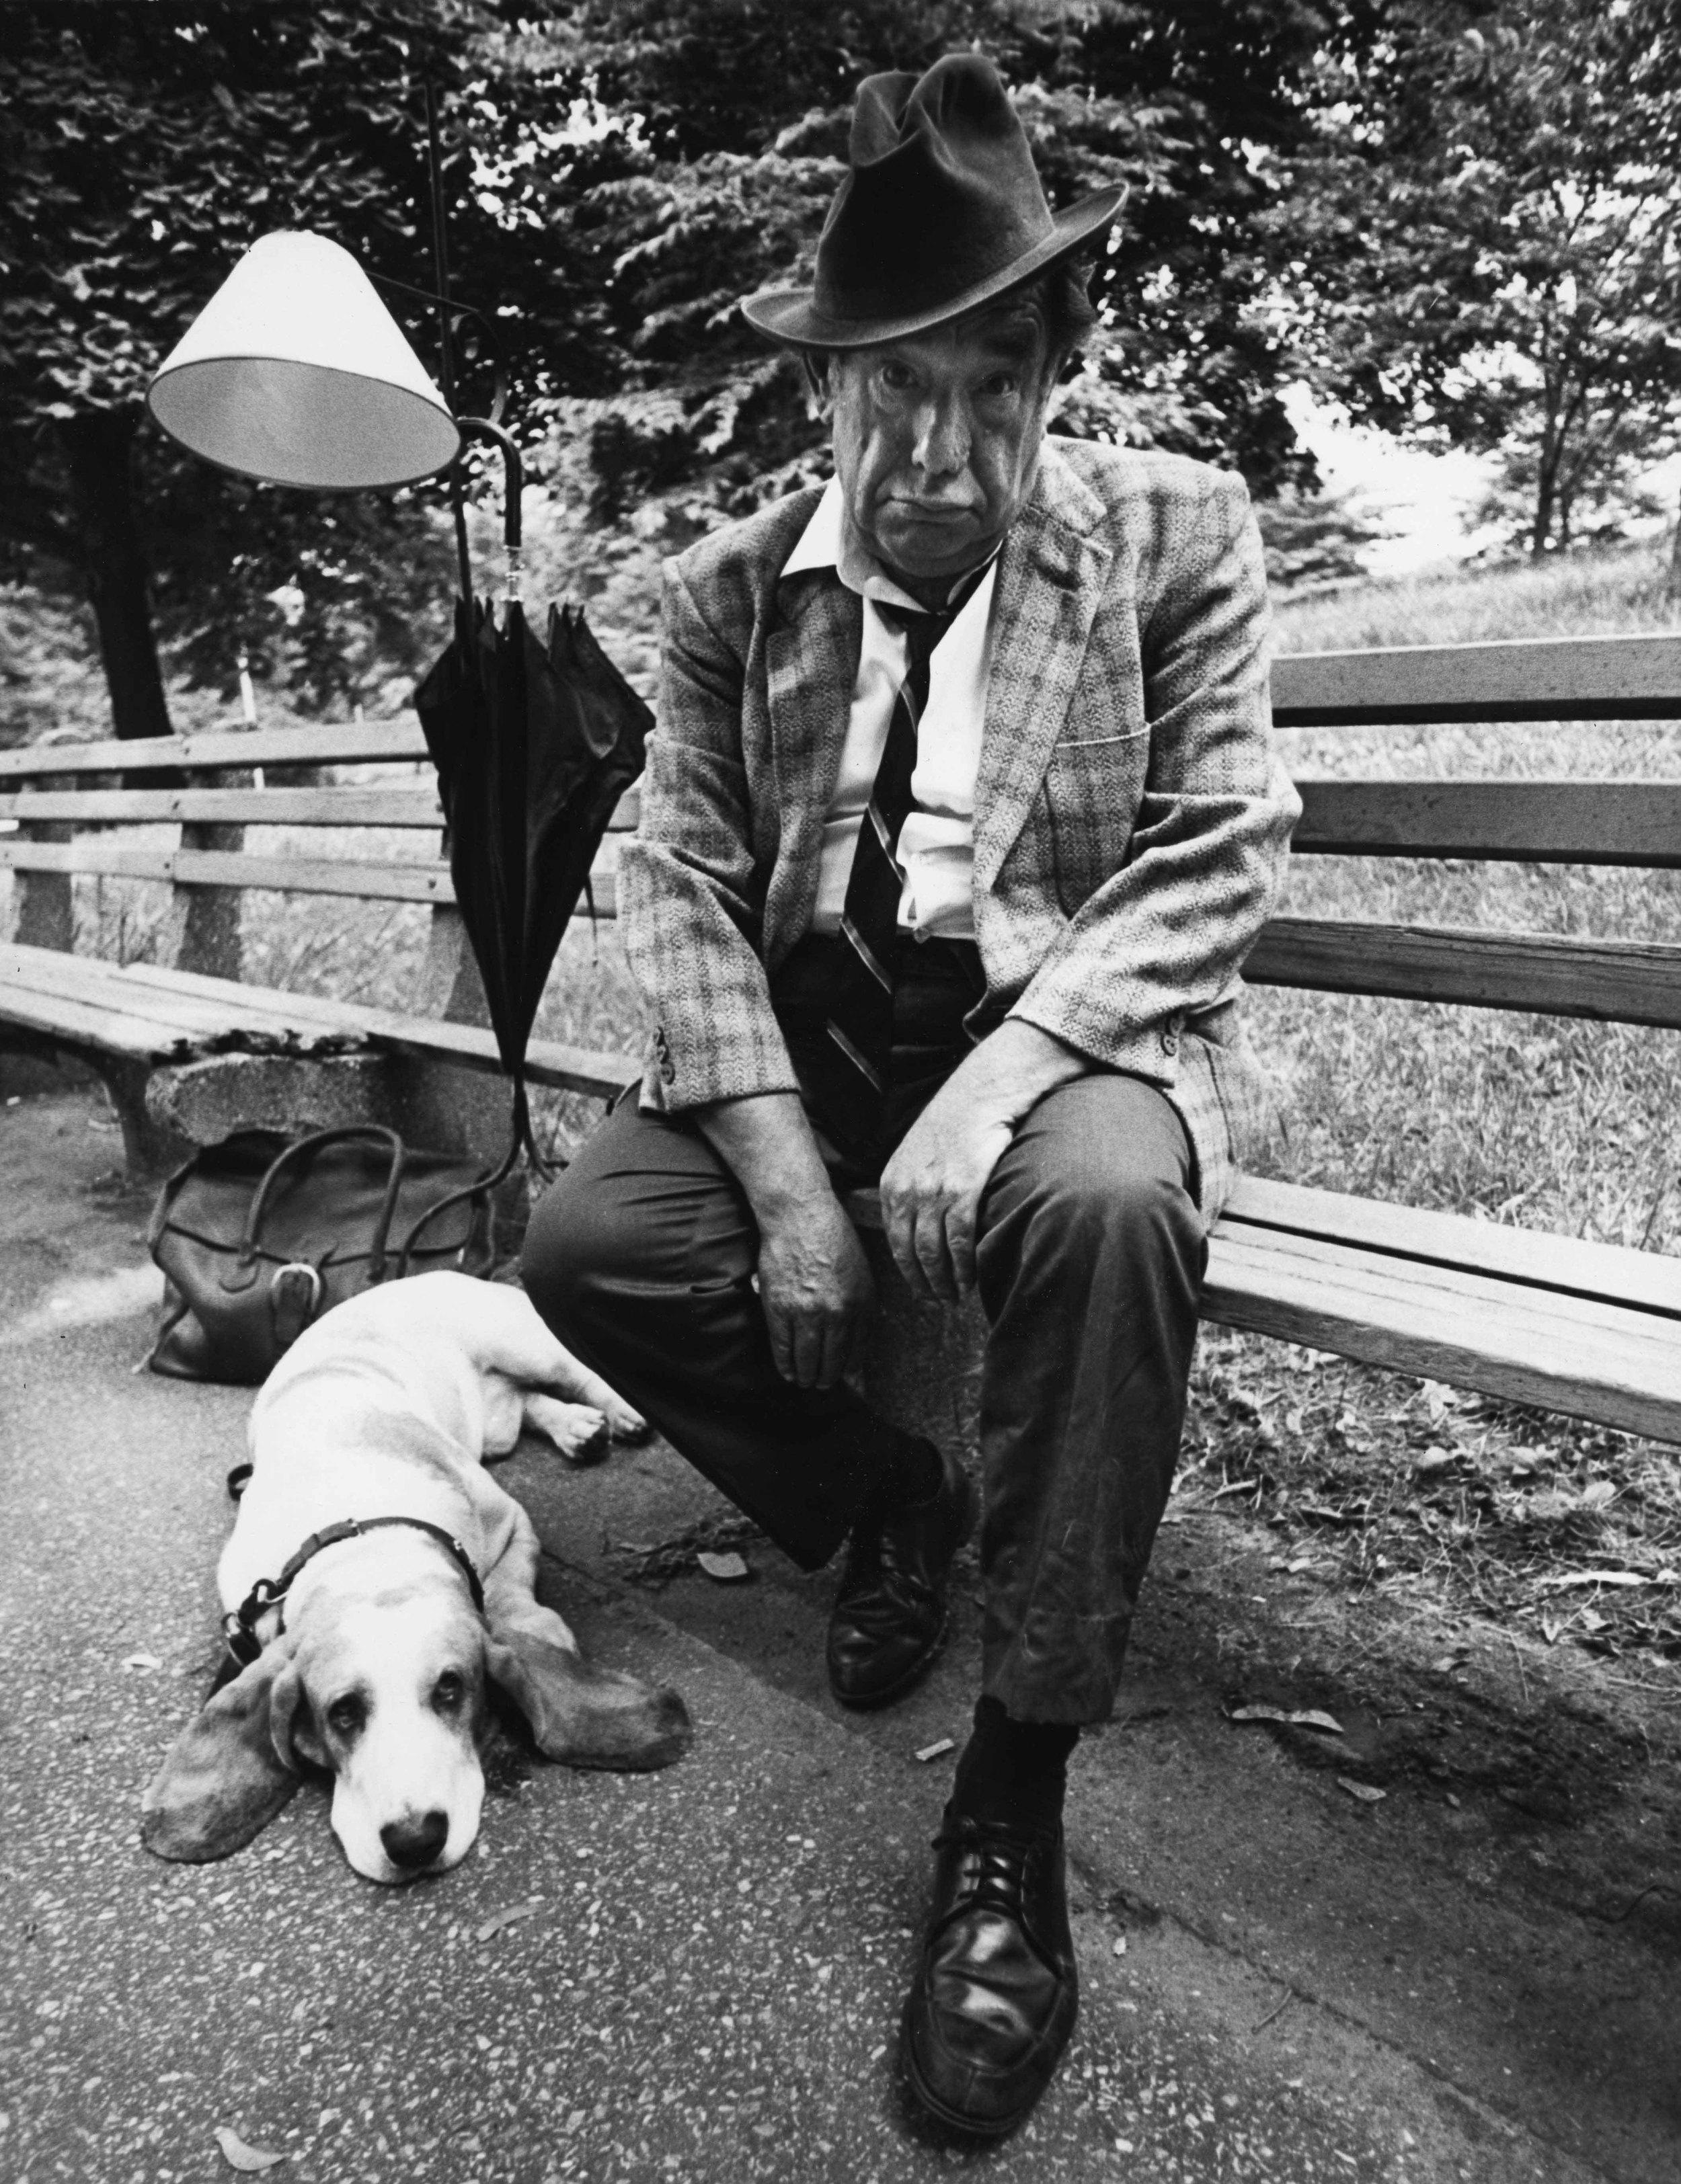 16_9_Man and dog in the park_Dan Wynn Archive.jpeg